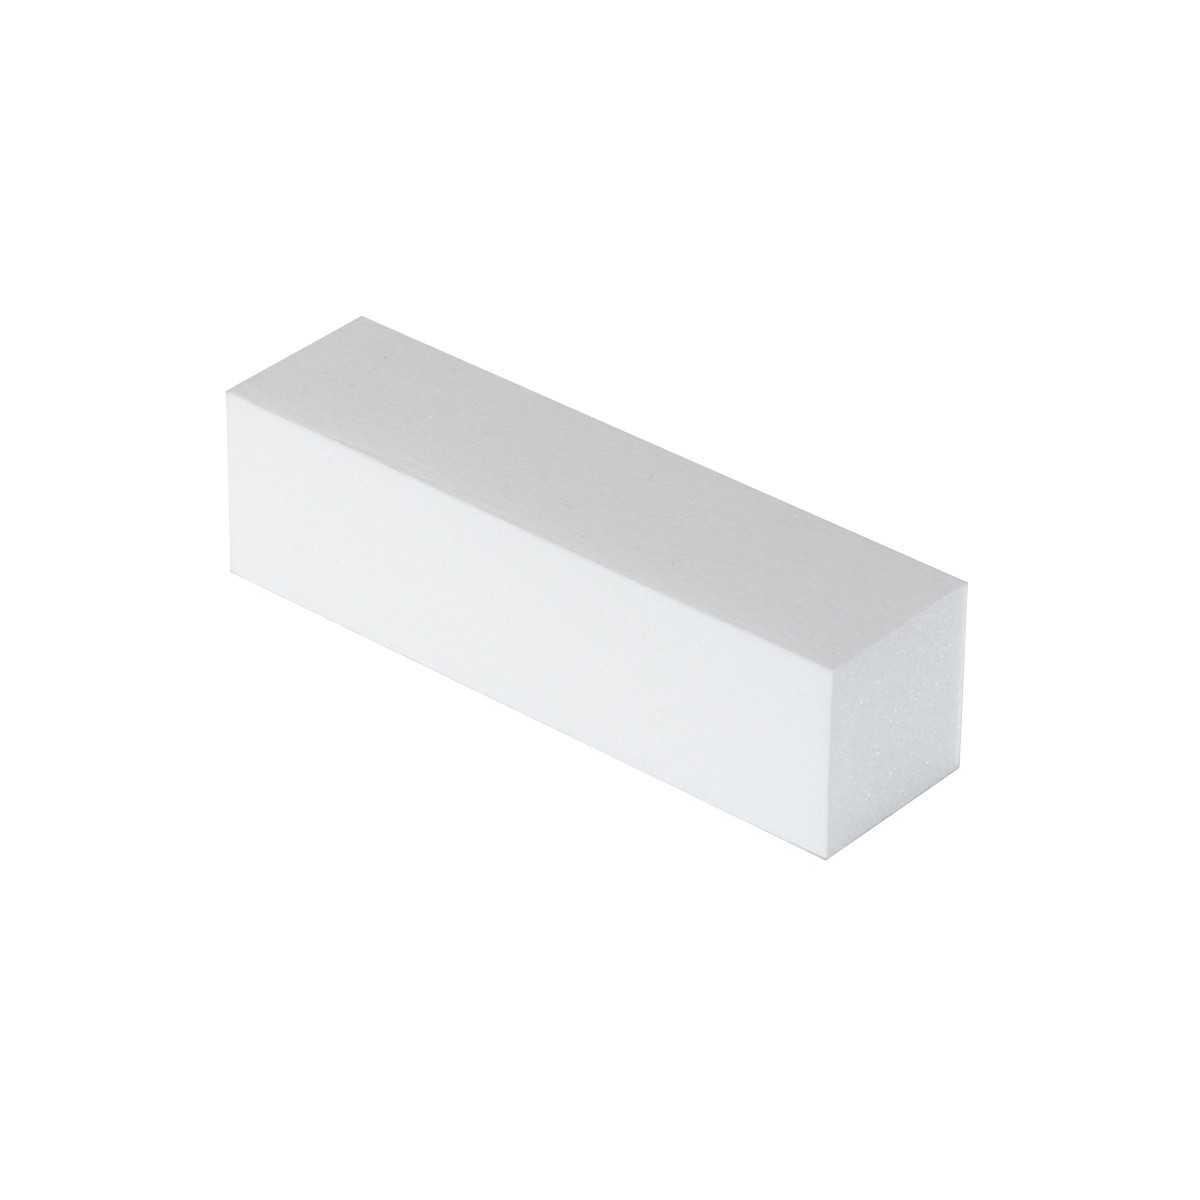 https://www.kit-manucure.com/187-thickbox_default/bloc-blanc-polissoir-grain-100100.jpg